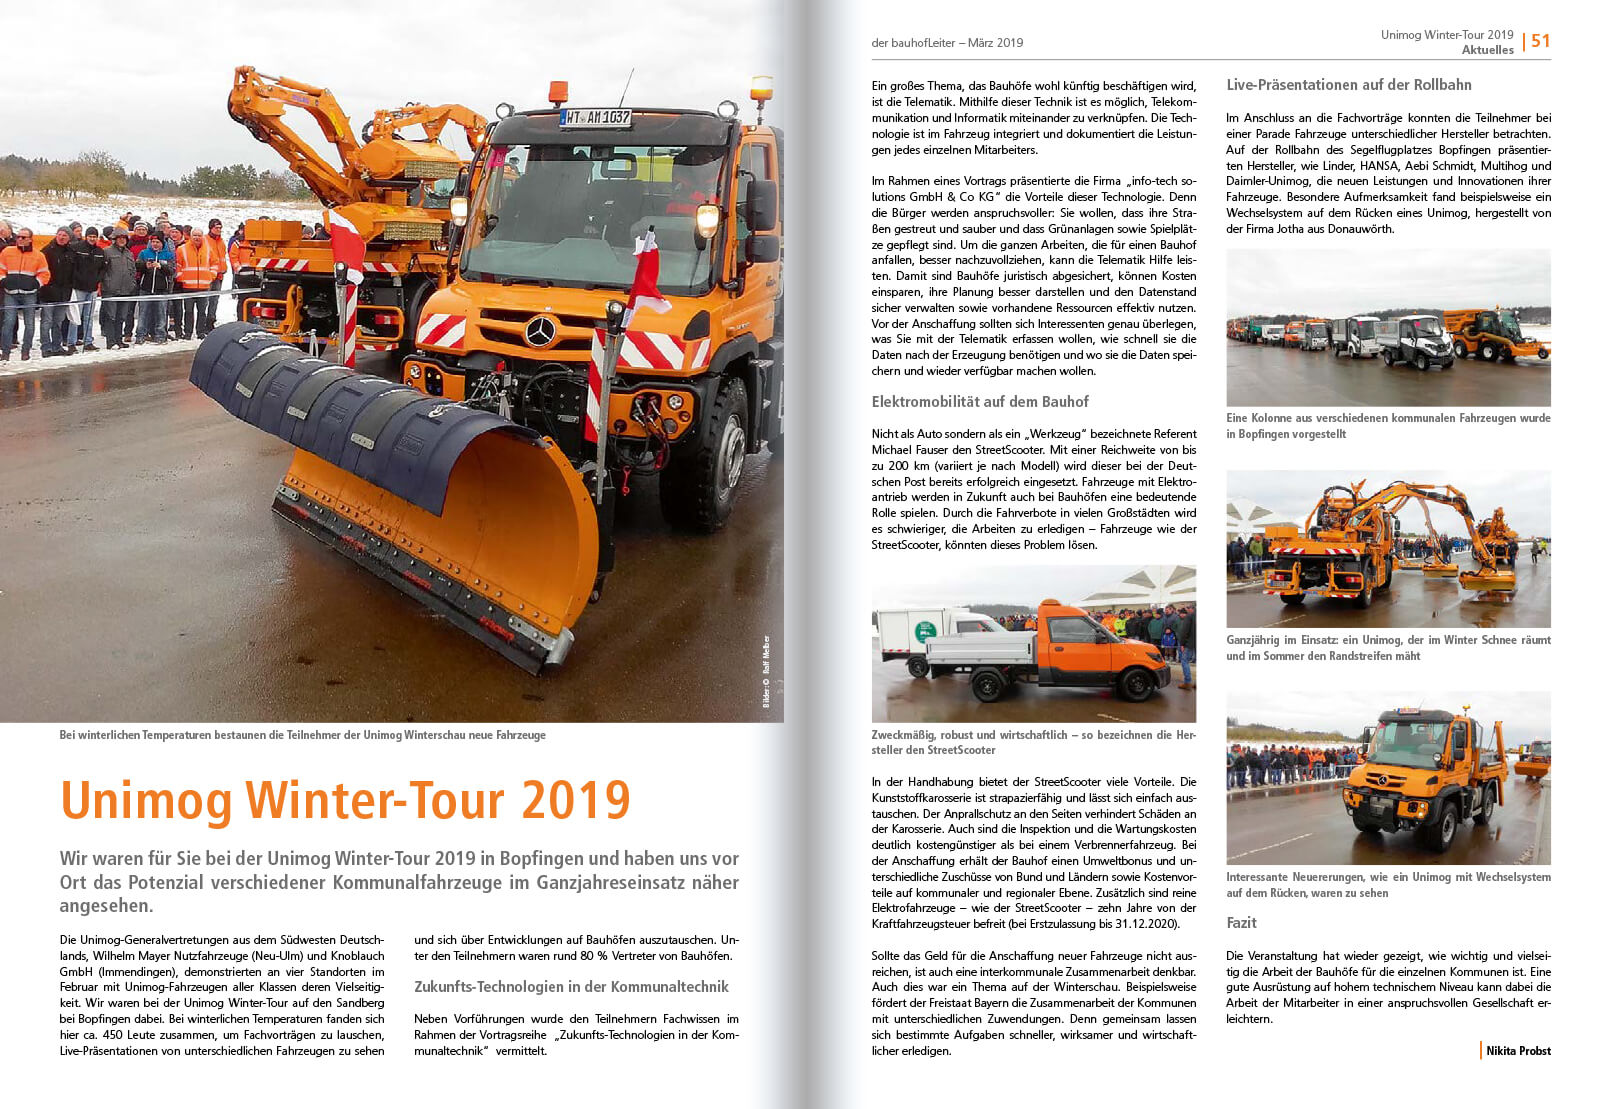 2019-03 Unimog Winter-Tour 2019